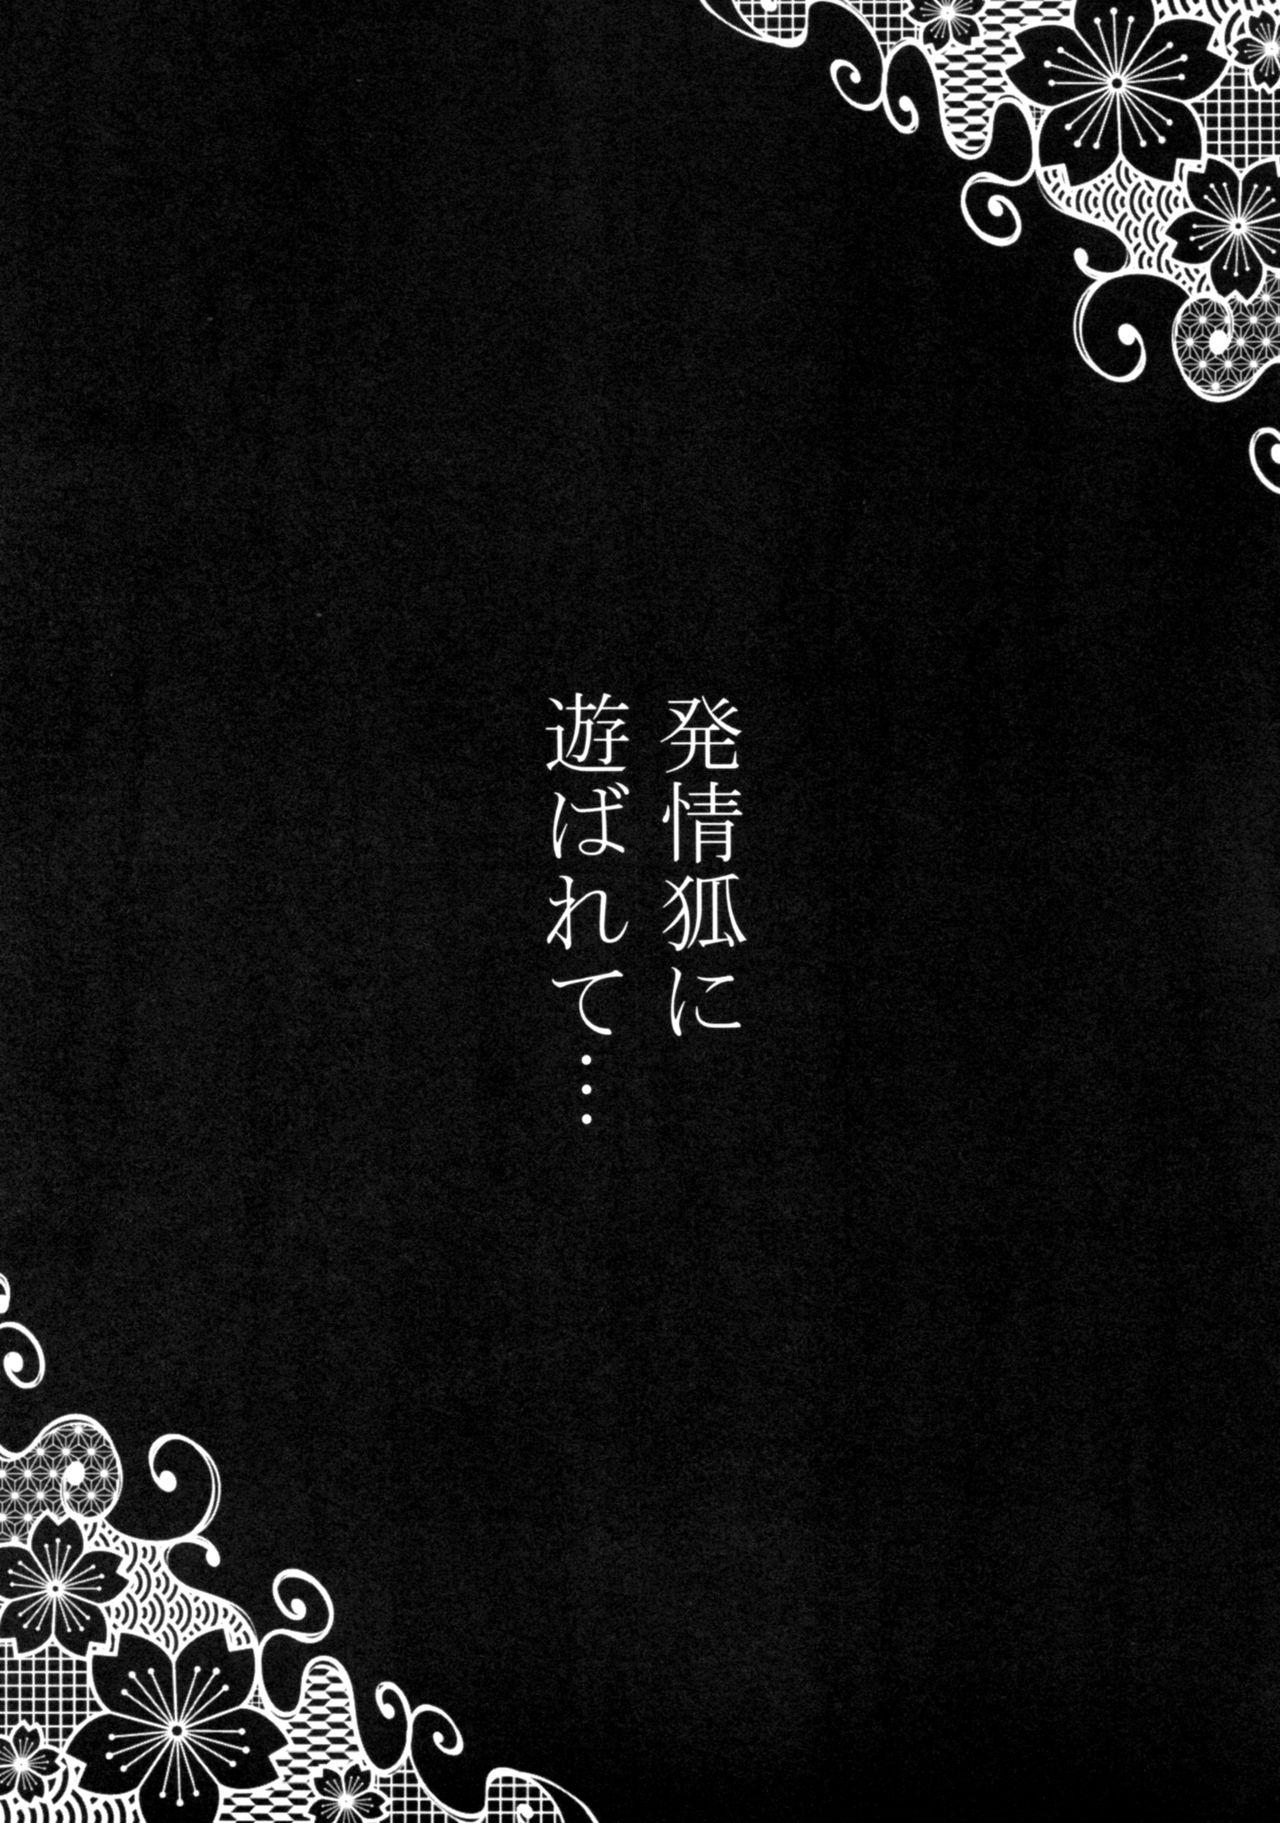 Hatsujou Kitsune ni Asobarete... | Toyed by foxes in heat 15